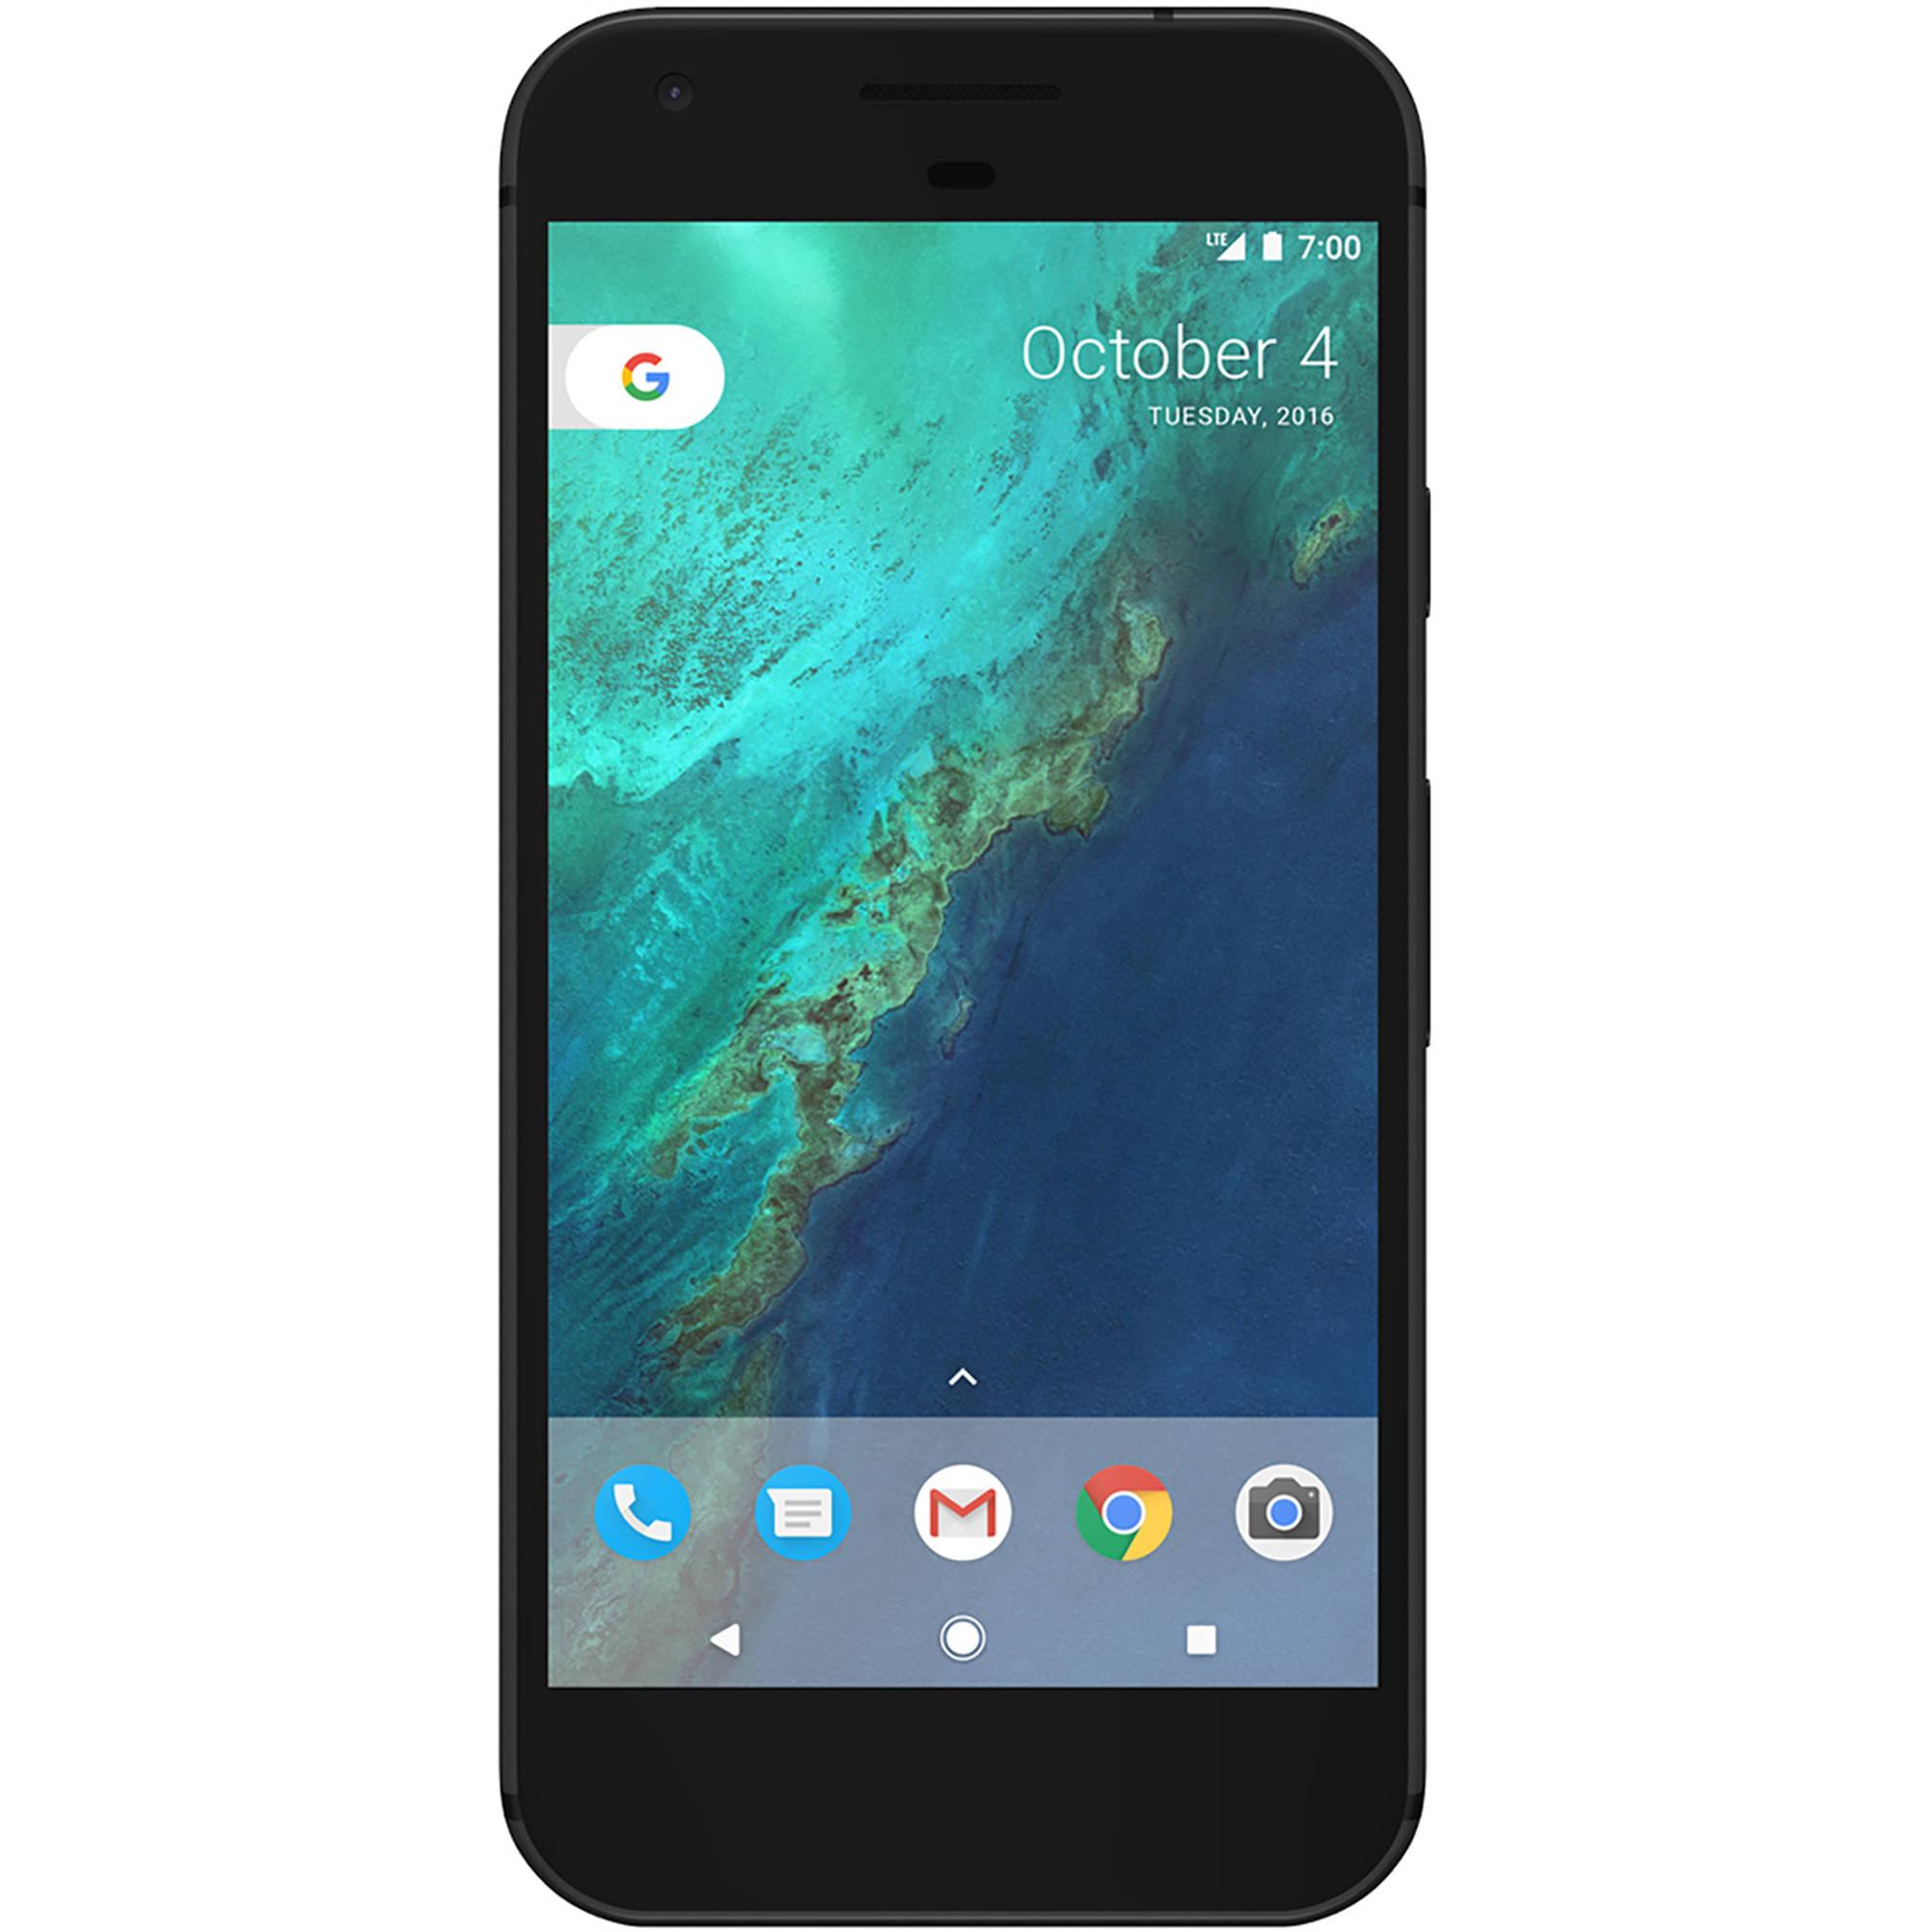 Google Pixel XL G-2PW2100 128GB Smartphone (Unlocked, Quite Black)